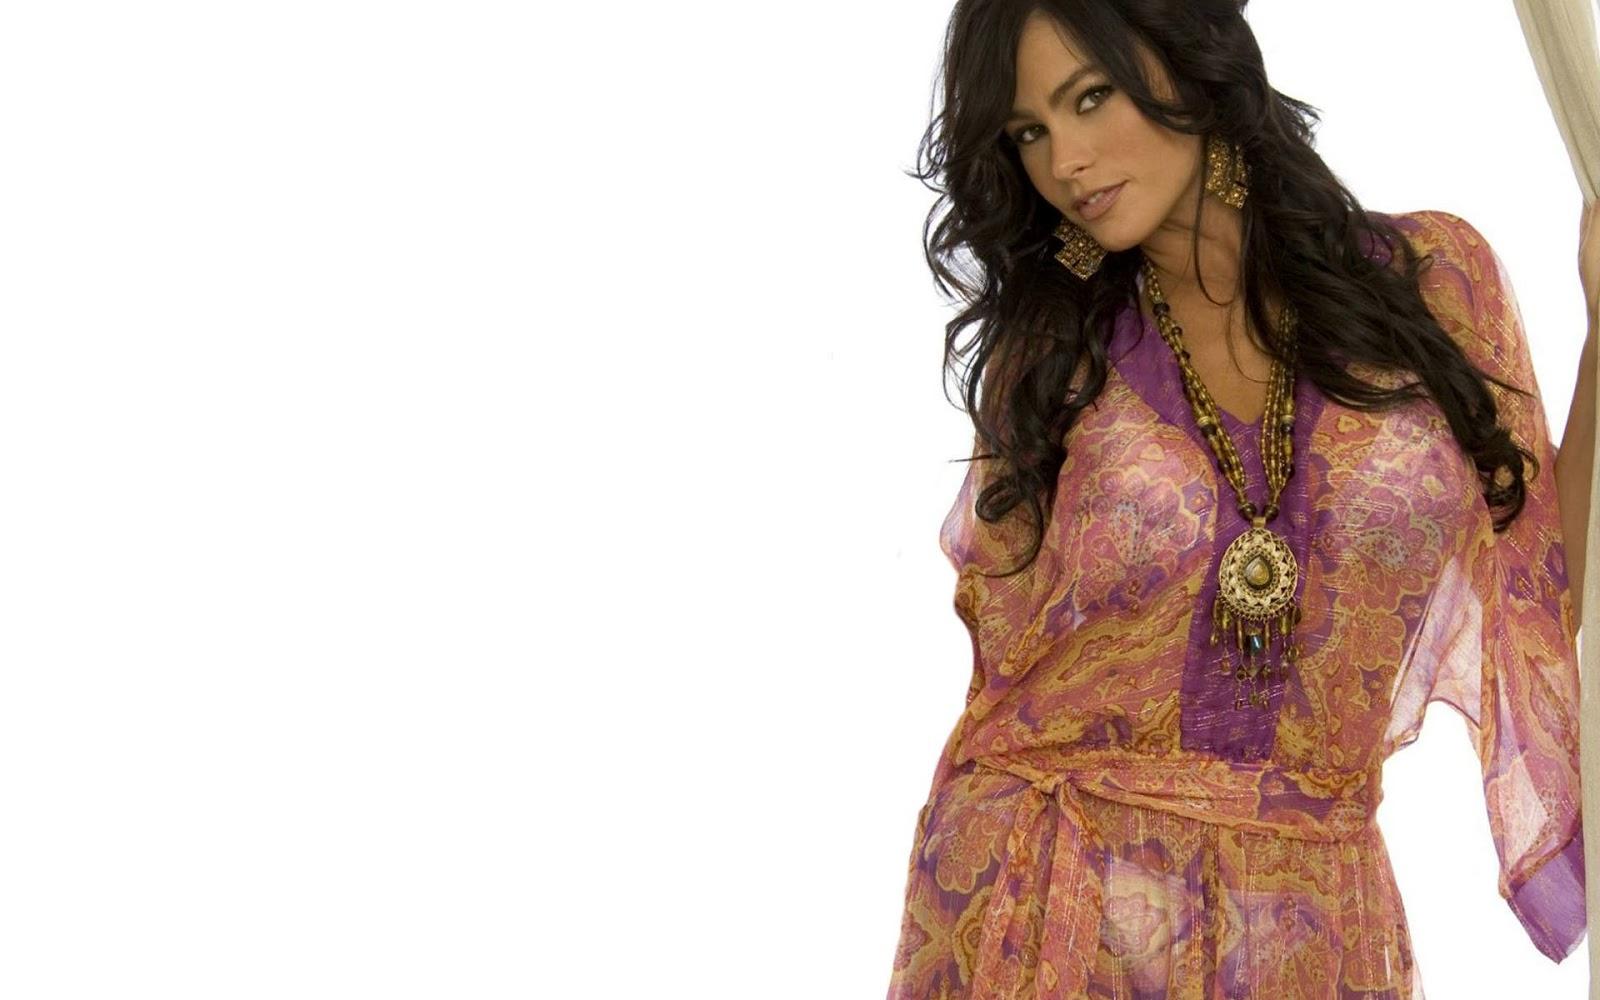 Beautiful Sofia Vergara